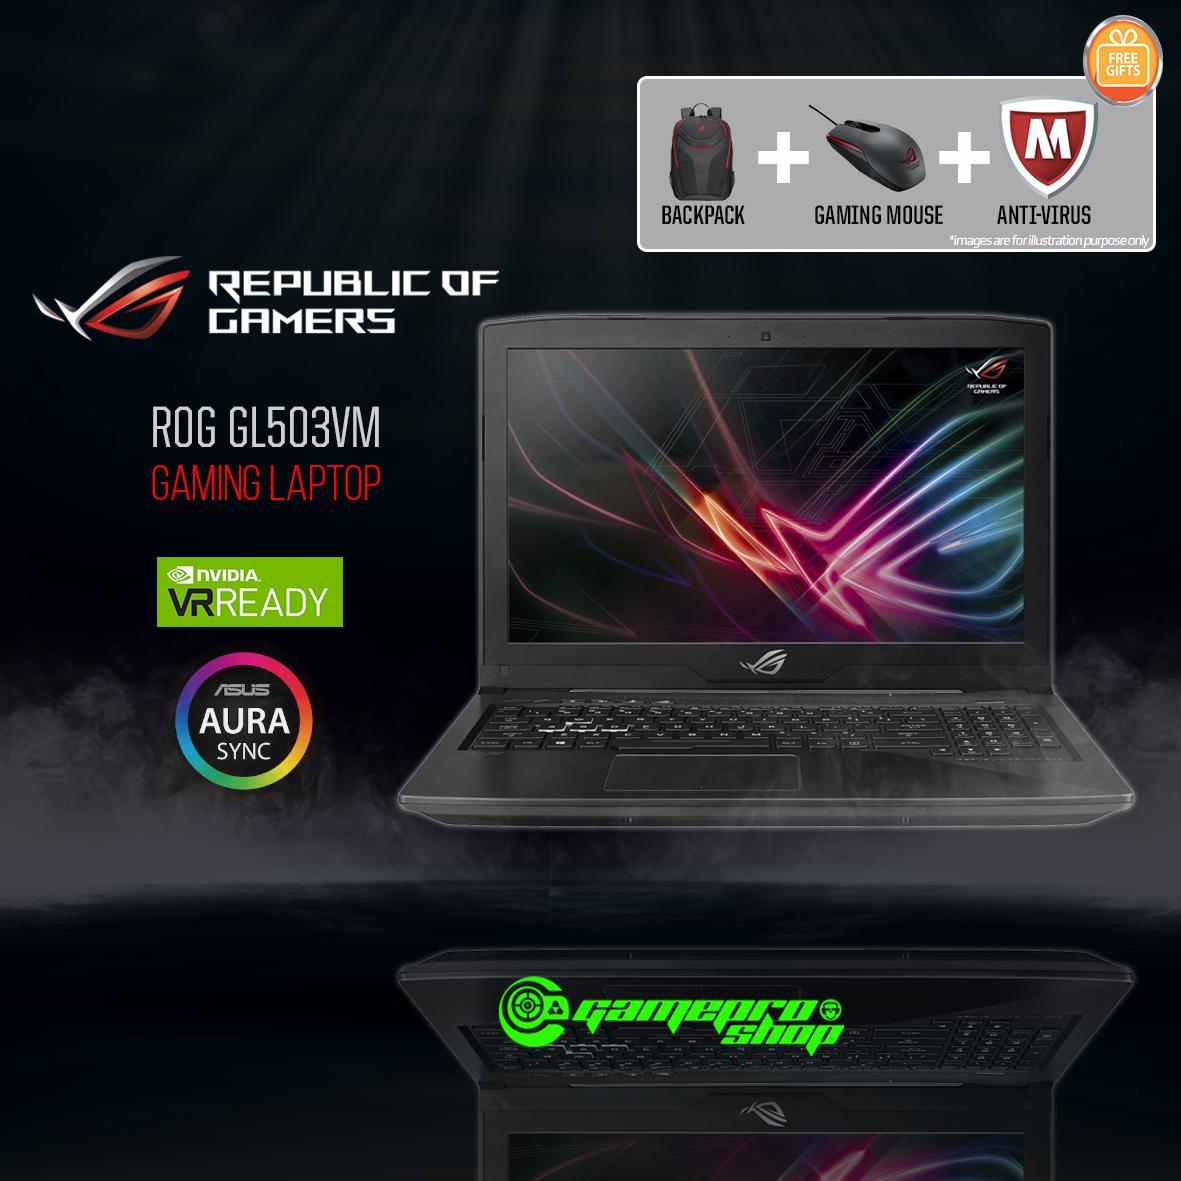 ASUS ROG Strix GL503VM - FY359T (i7-7700HQ/ GTX1060 6GB/ 128GB SSD+ 1TB HDD) 15.6 FHD *COMEX PROMO*